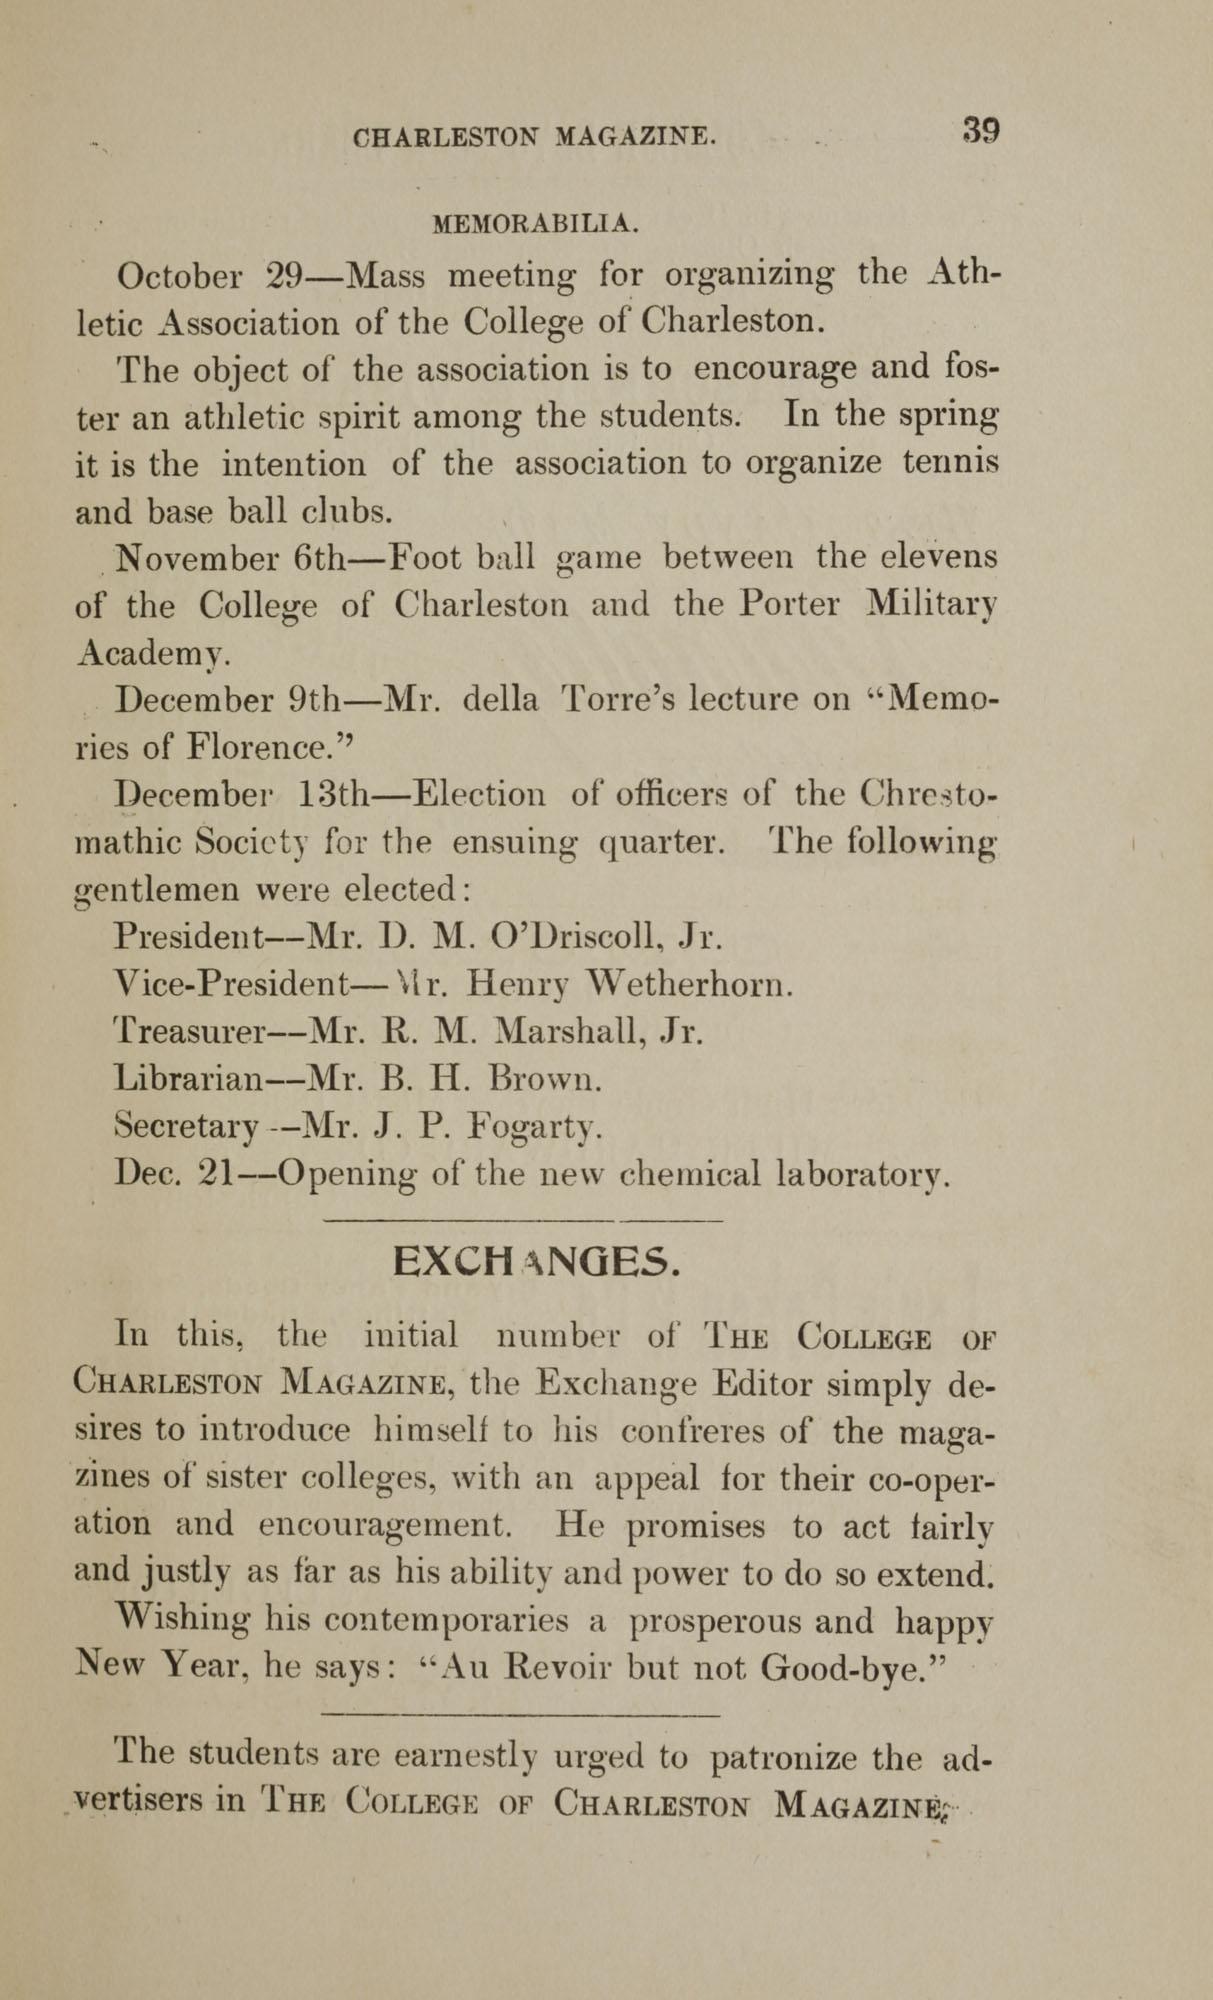 College of Charleston Magazine, 1898, Vol I. No. 1, page 39